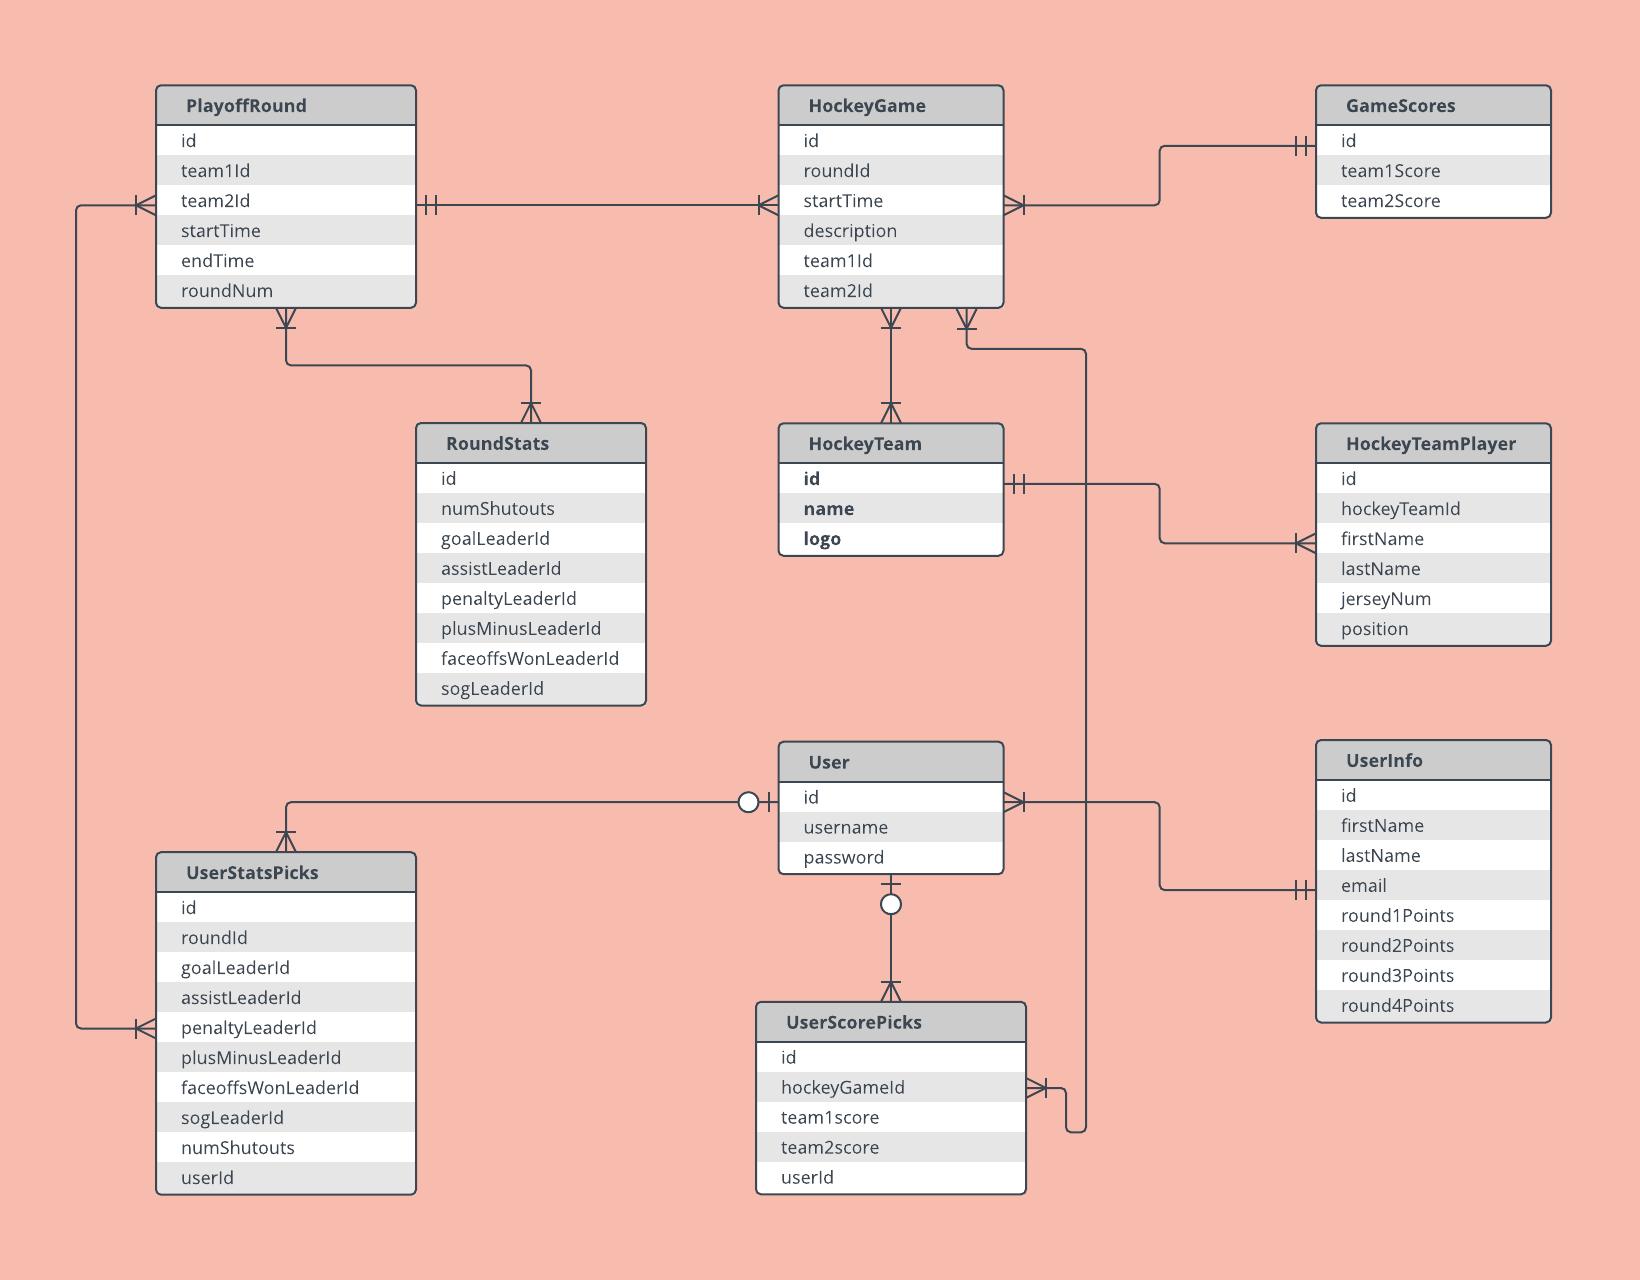 25 Entity Relationship Diagram Samples | Relationship ...